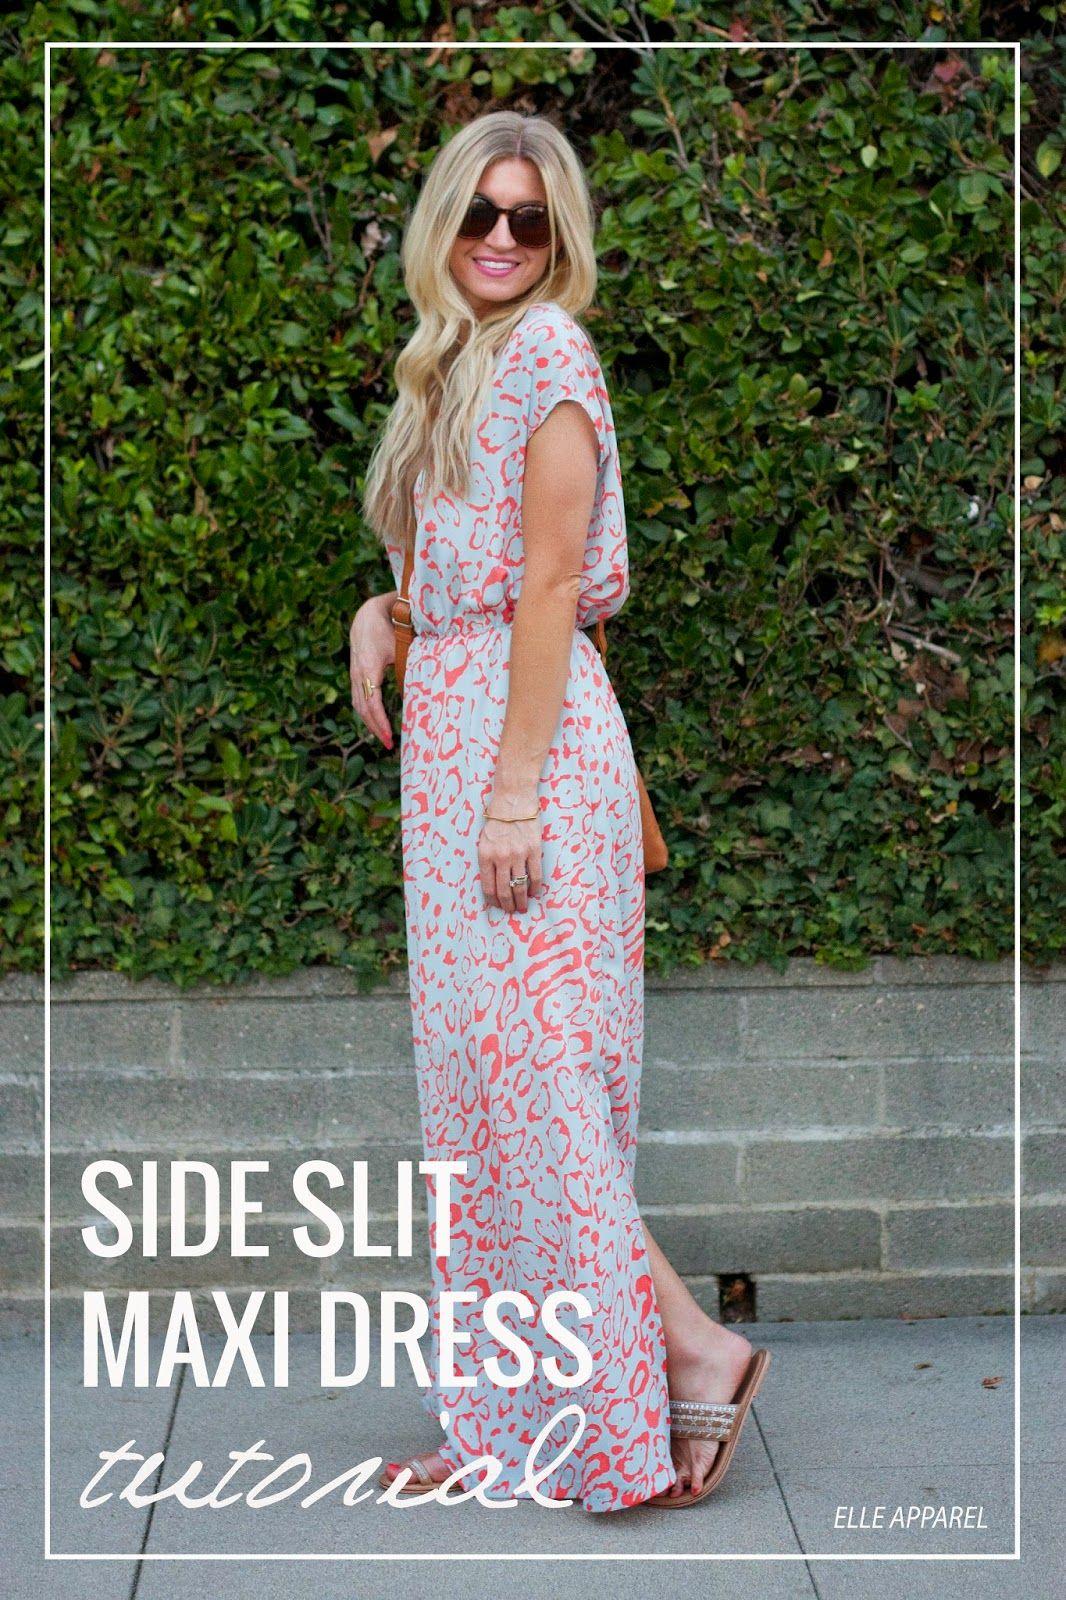 Elle apparel pattern play side slit maxi dress tutorial robes